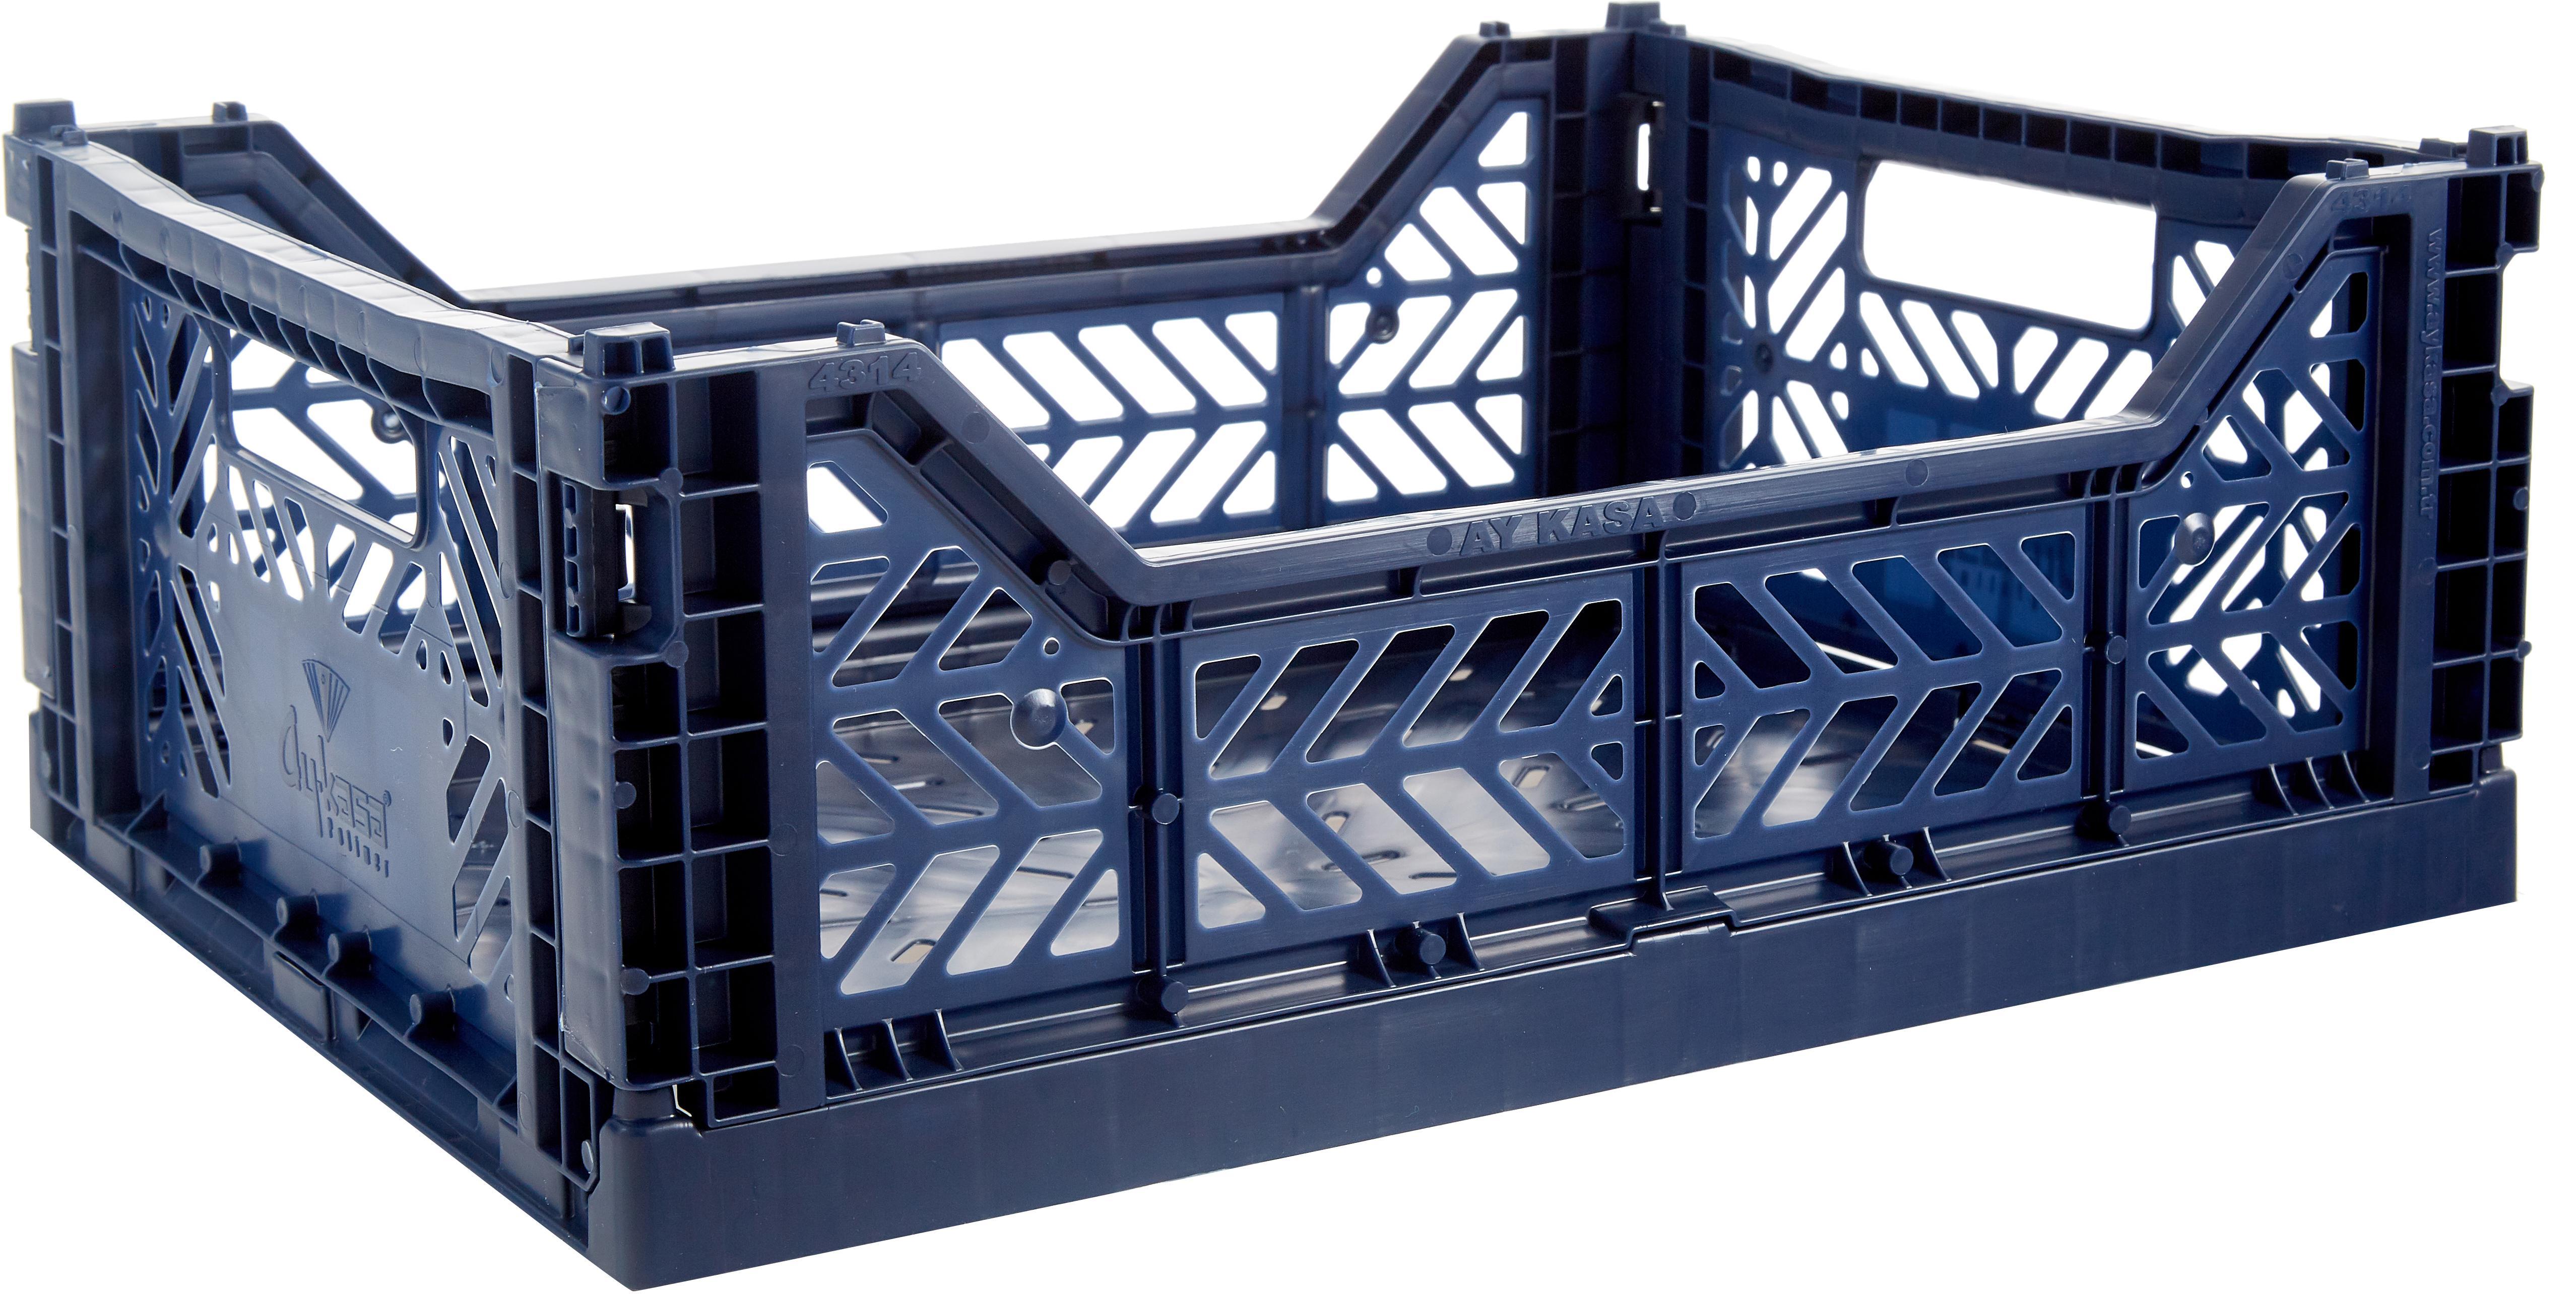 Klappkiste Navy, stapelbar, medium, Recycelter Kunststoff, Navyblau, 40 x 14 cm